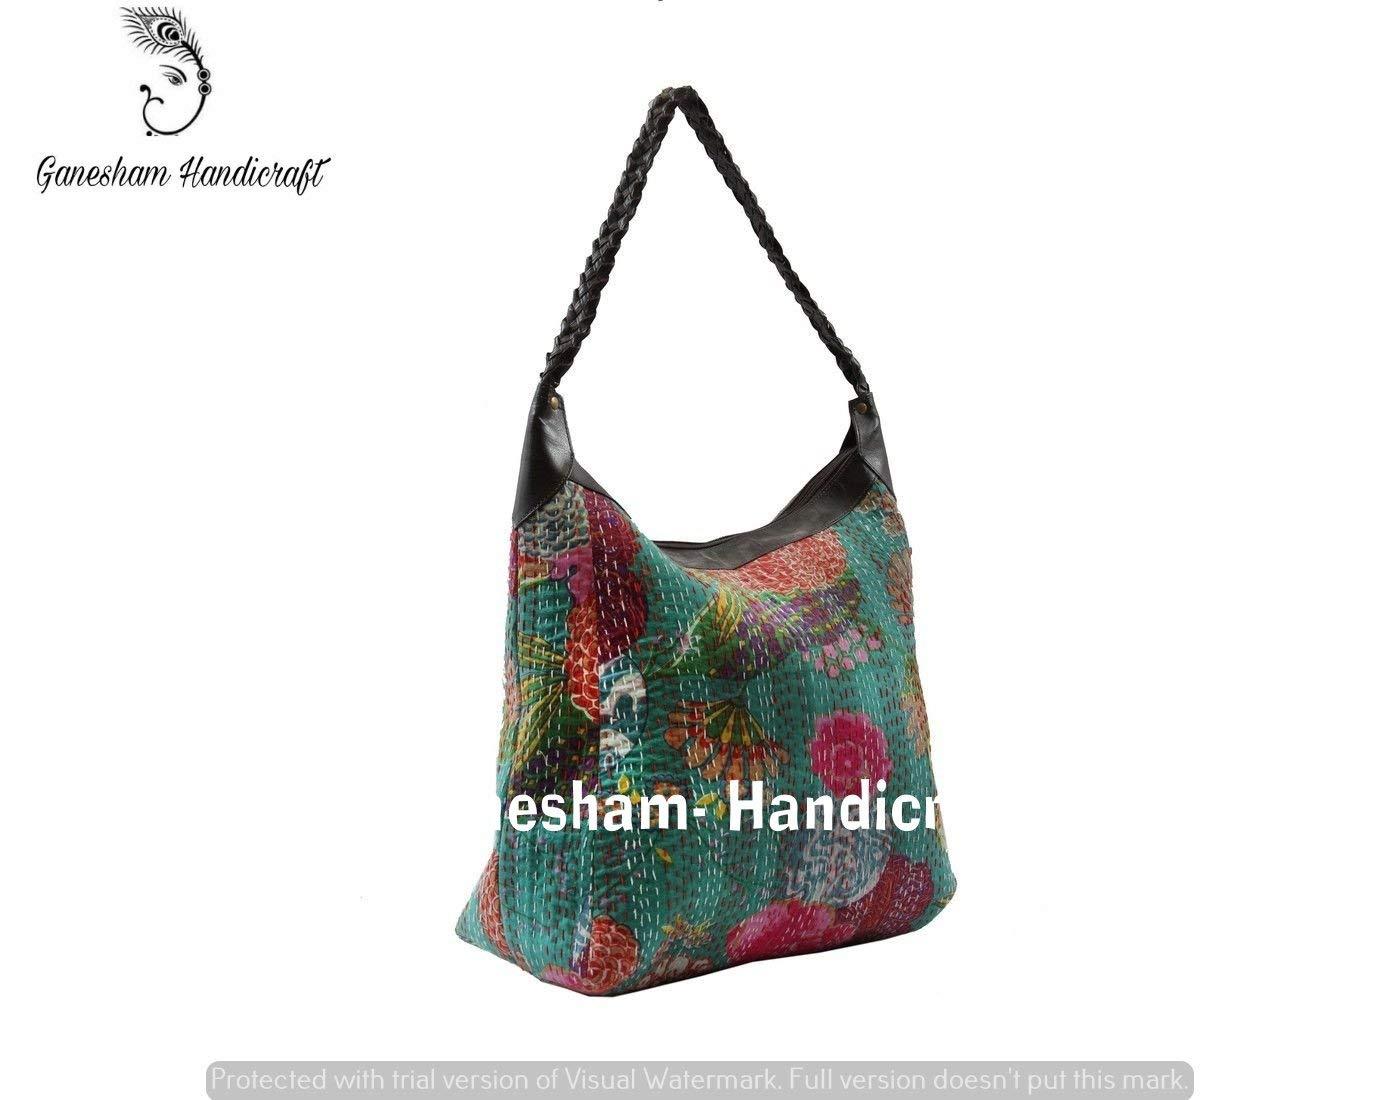 cde1b6a8952 Get Quotations · Indian Handmade Bohemian Kantha Shoulder Bags Hippe  Top-Handle Cotton Handbag Boho Hobo Tote Bag